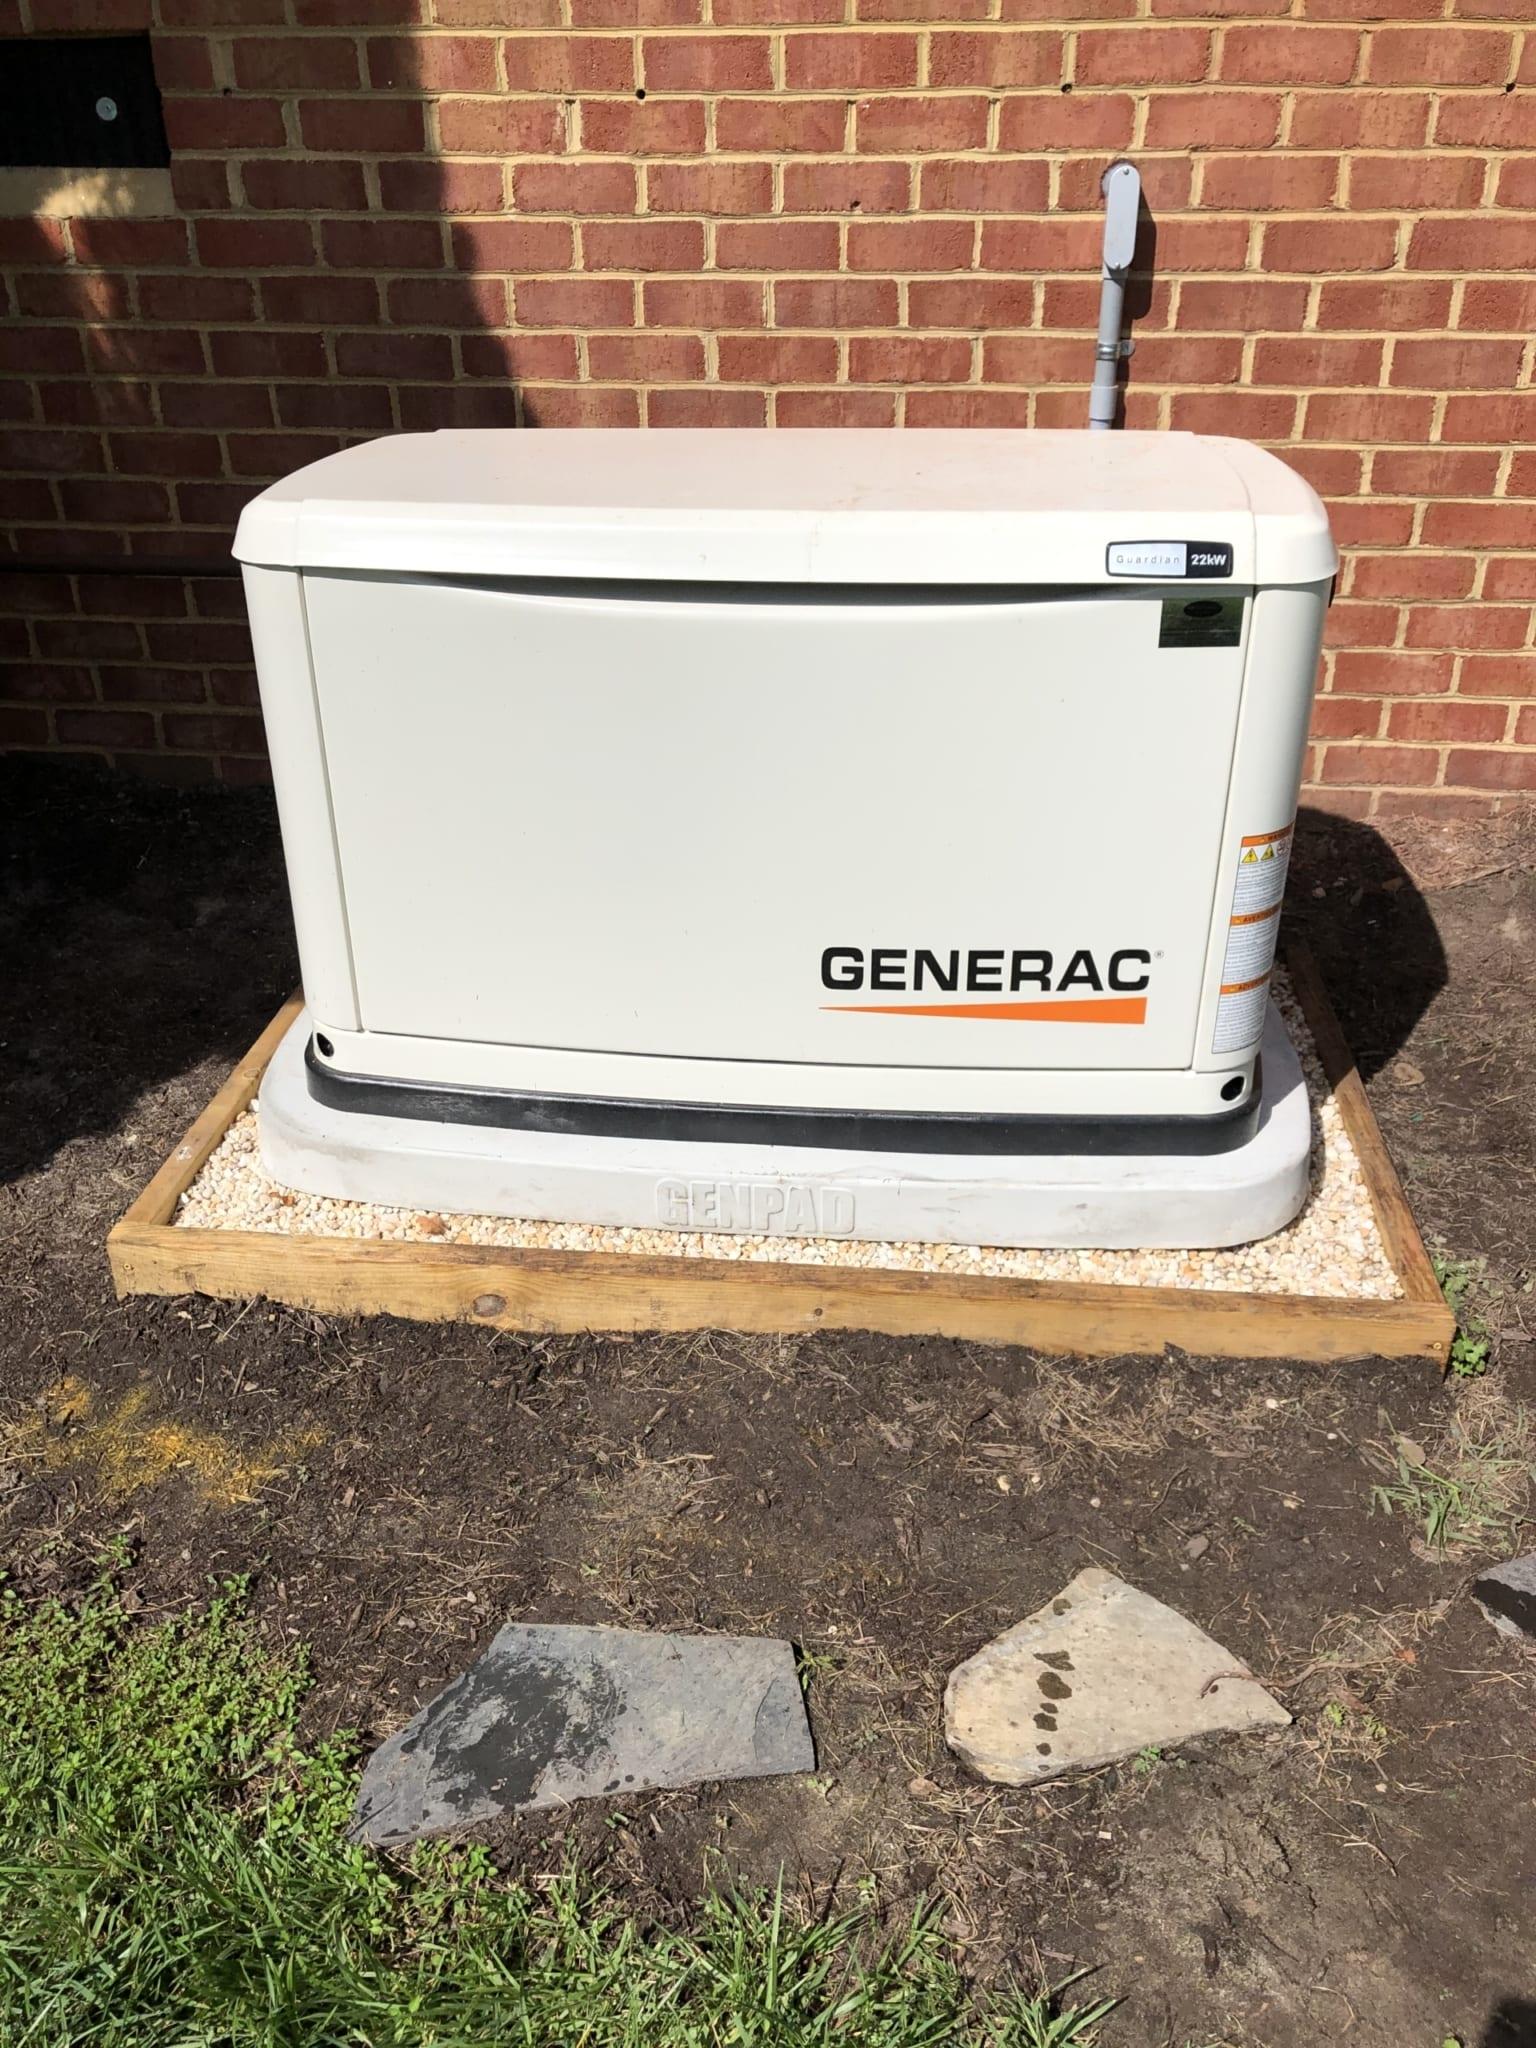 1.6.20 Chesterfield Generac Automatic Standby Generator